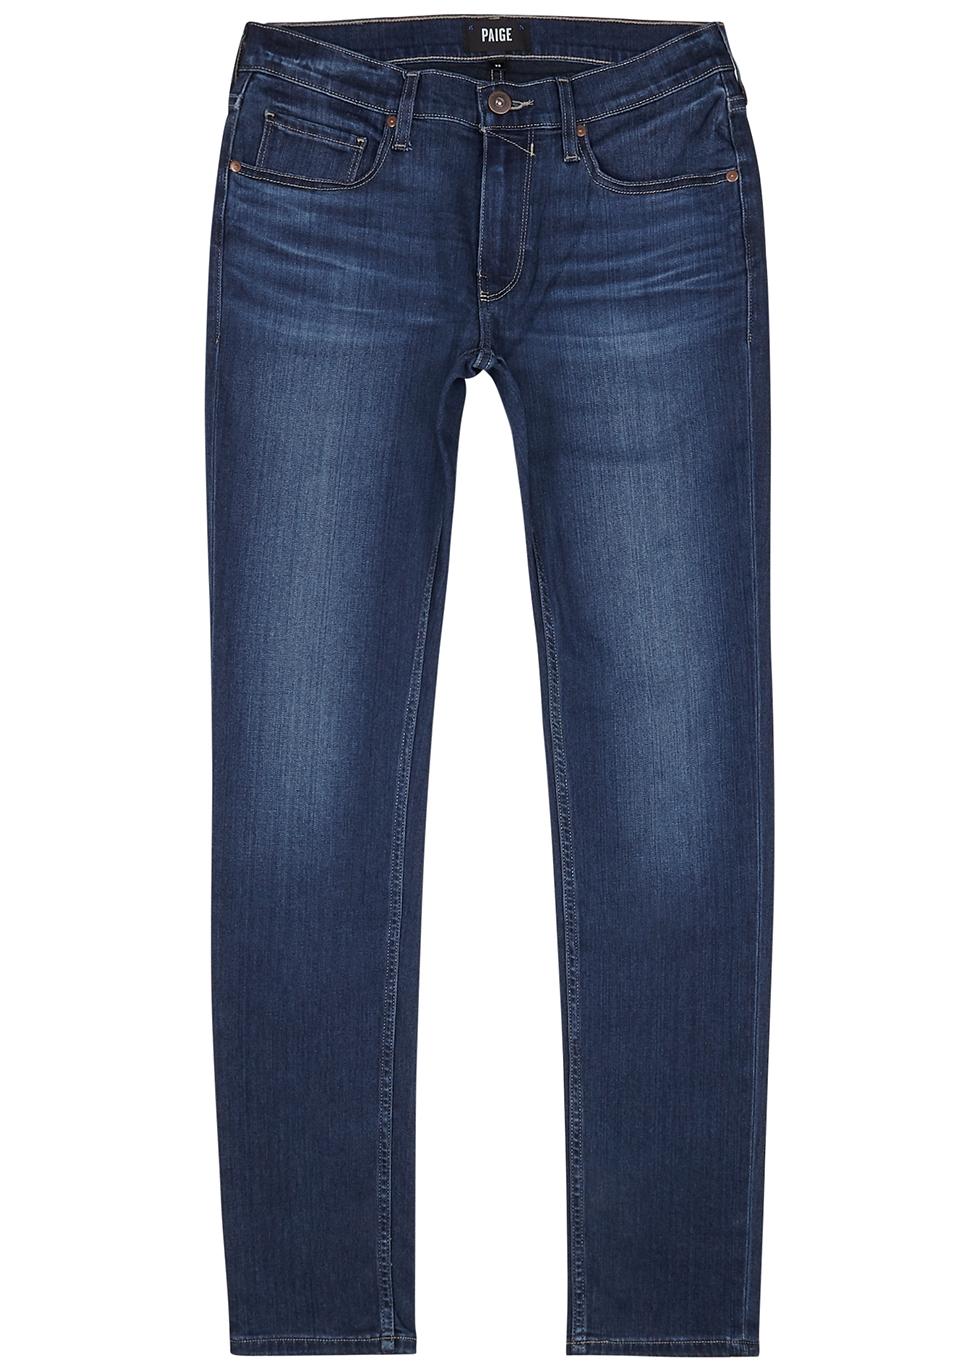 Croft blue skinny jeans